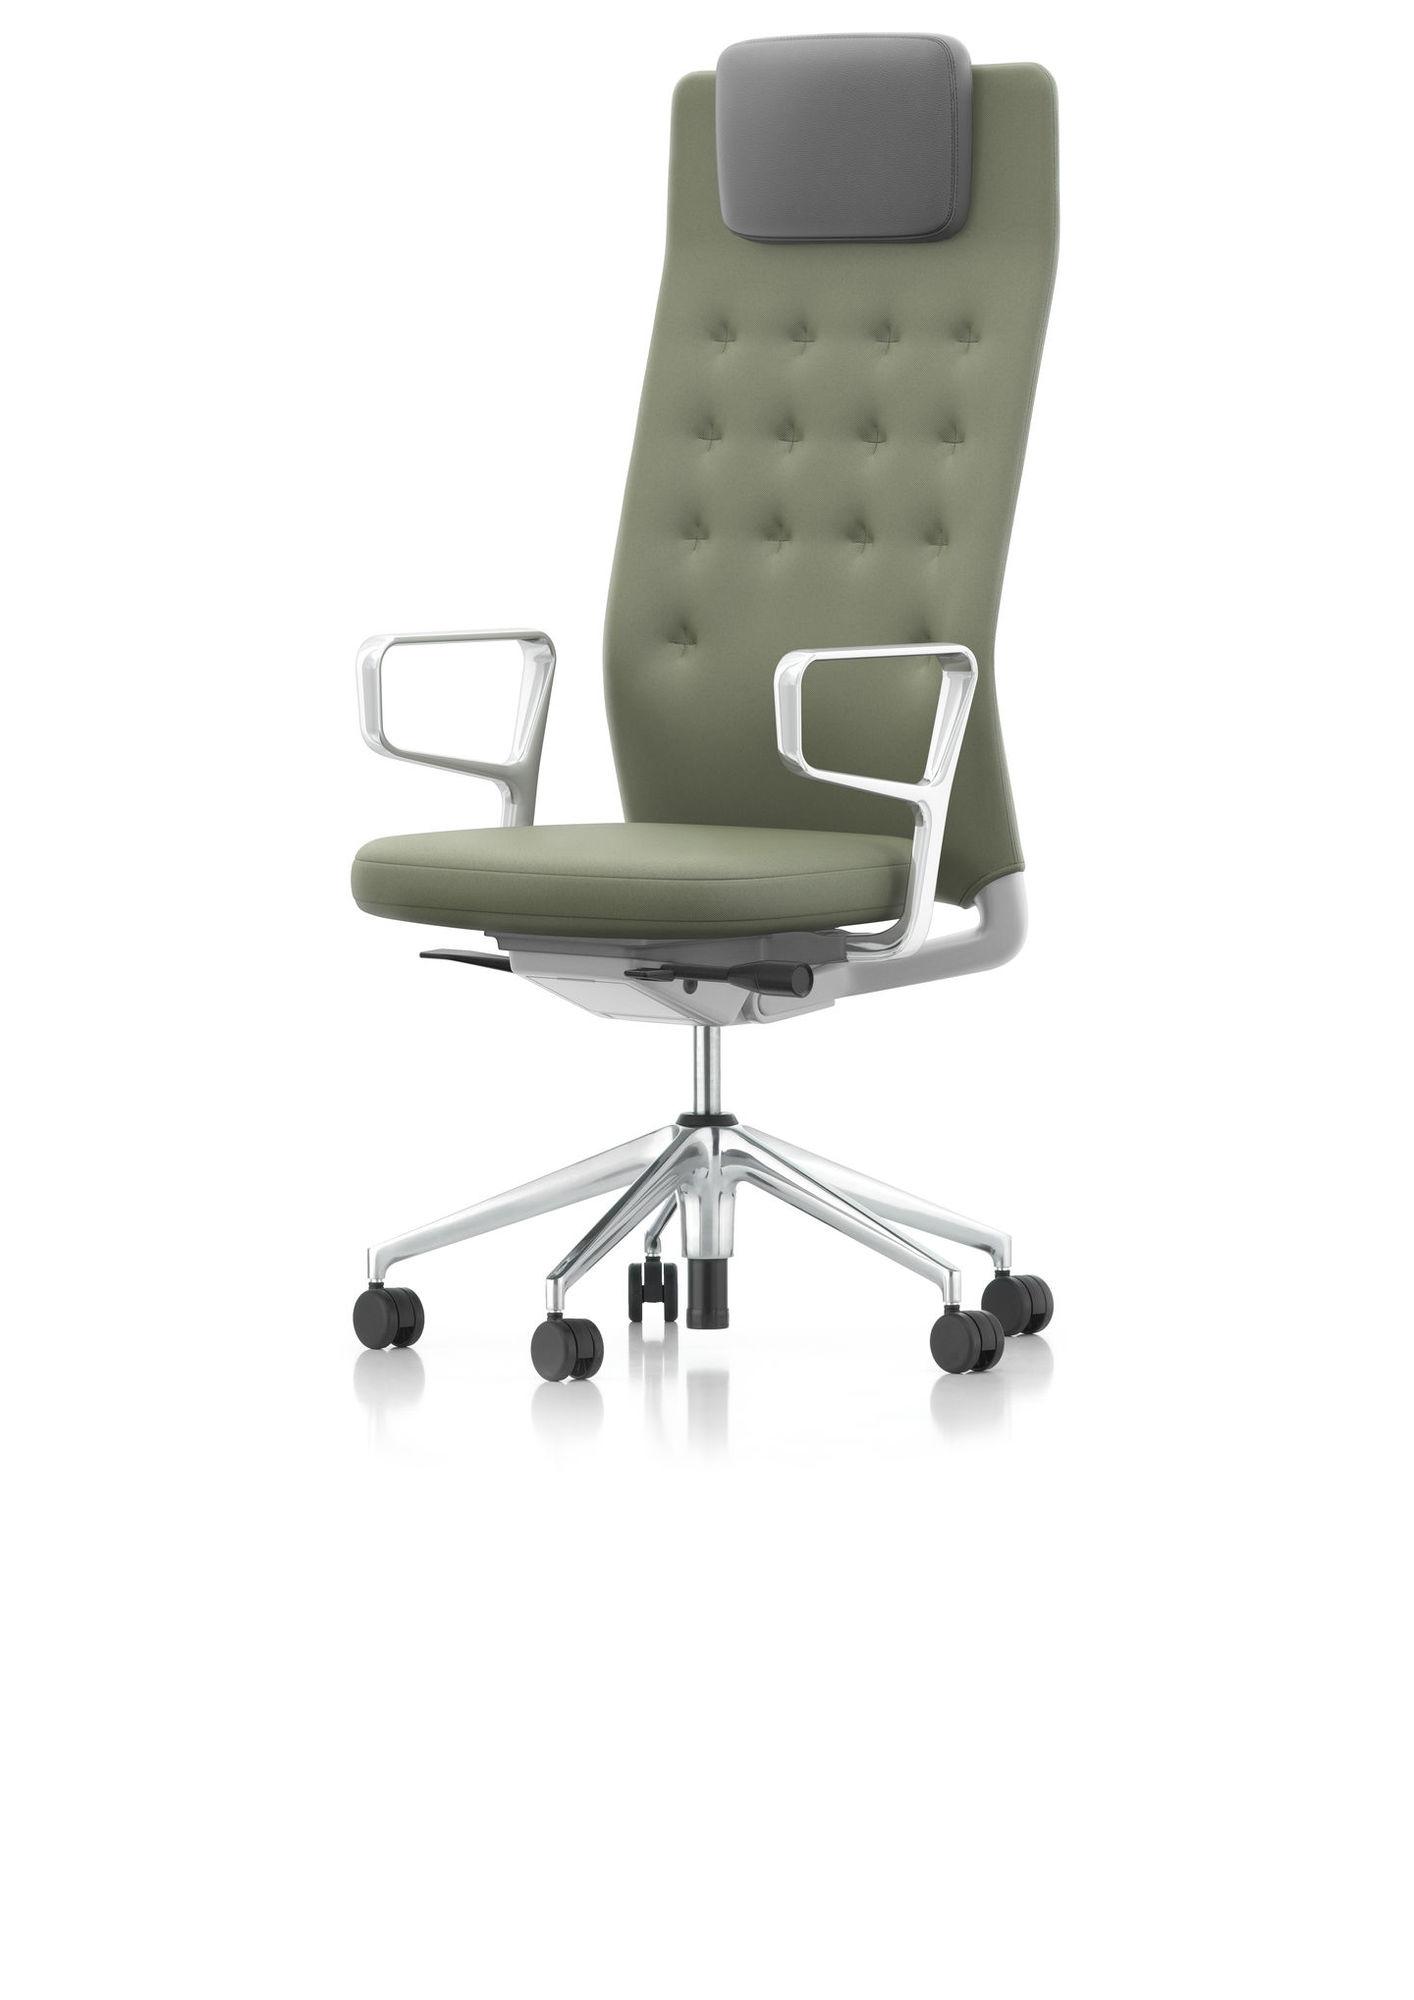 ID Chair - ID Trim L ohne Lumbalstütze Bürodrehstuhl Vitra